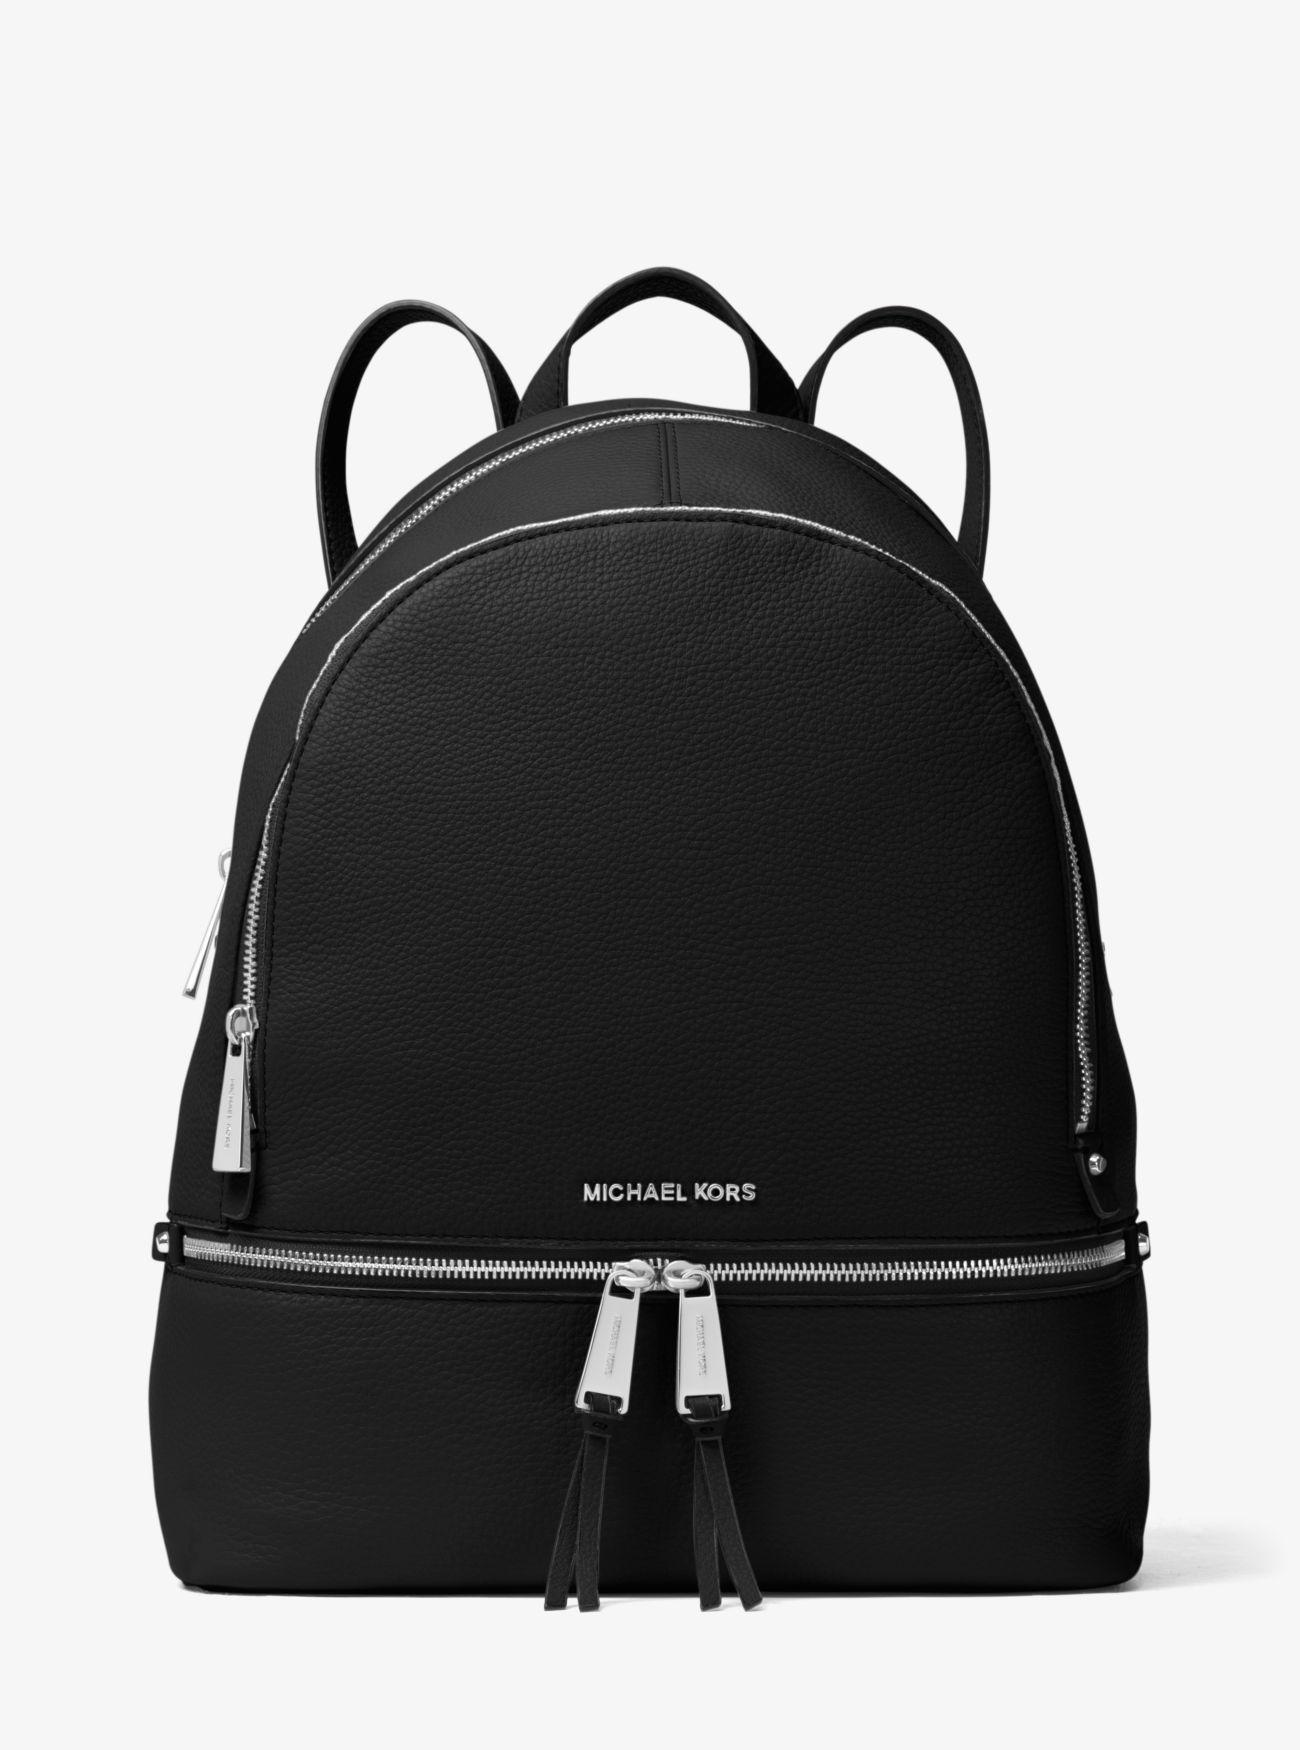 59946421bd77 Michael Kors - Black Rhea Large Leather Backpack - Lyst. View fullscreen